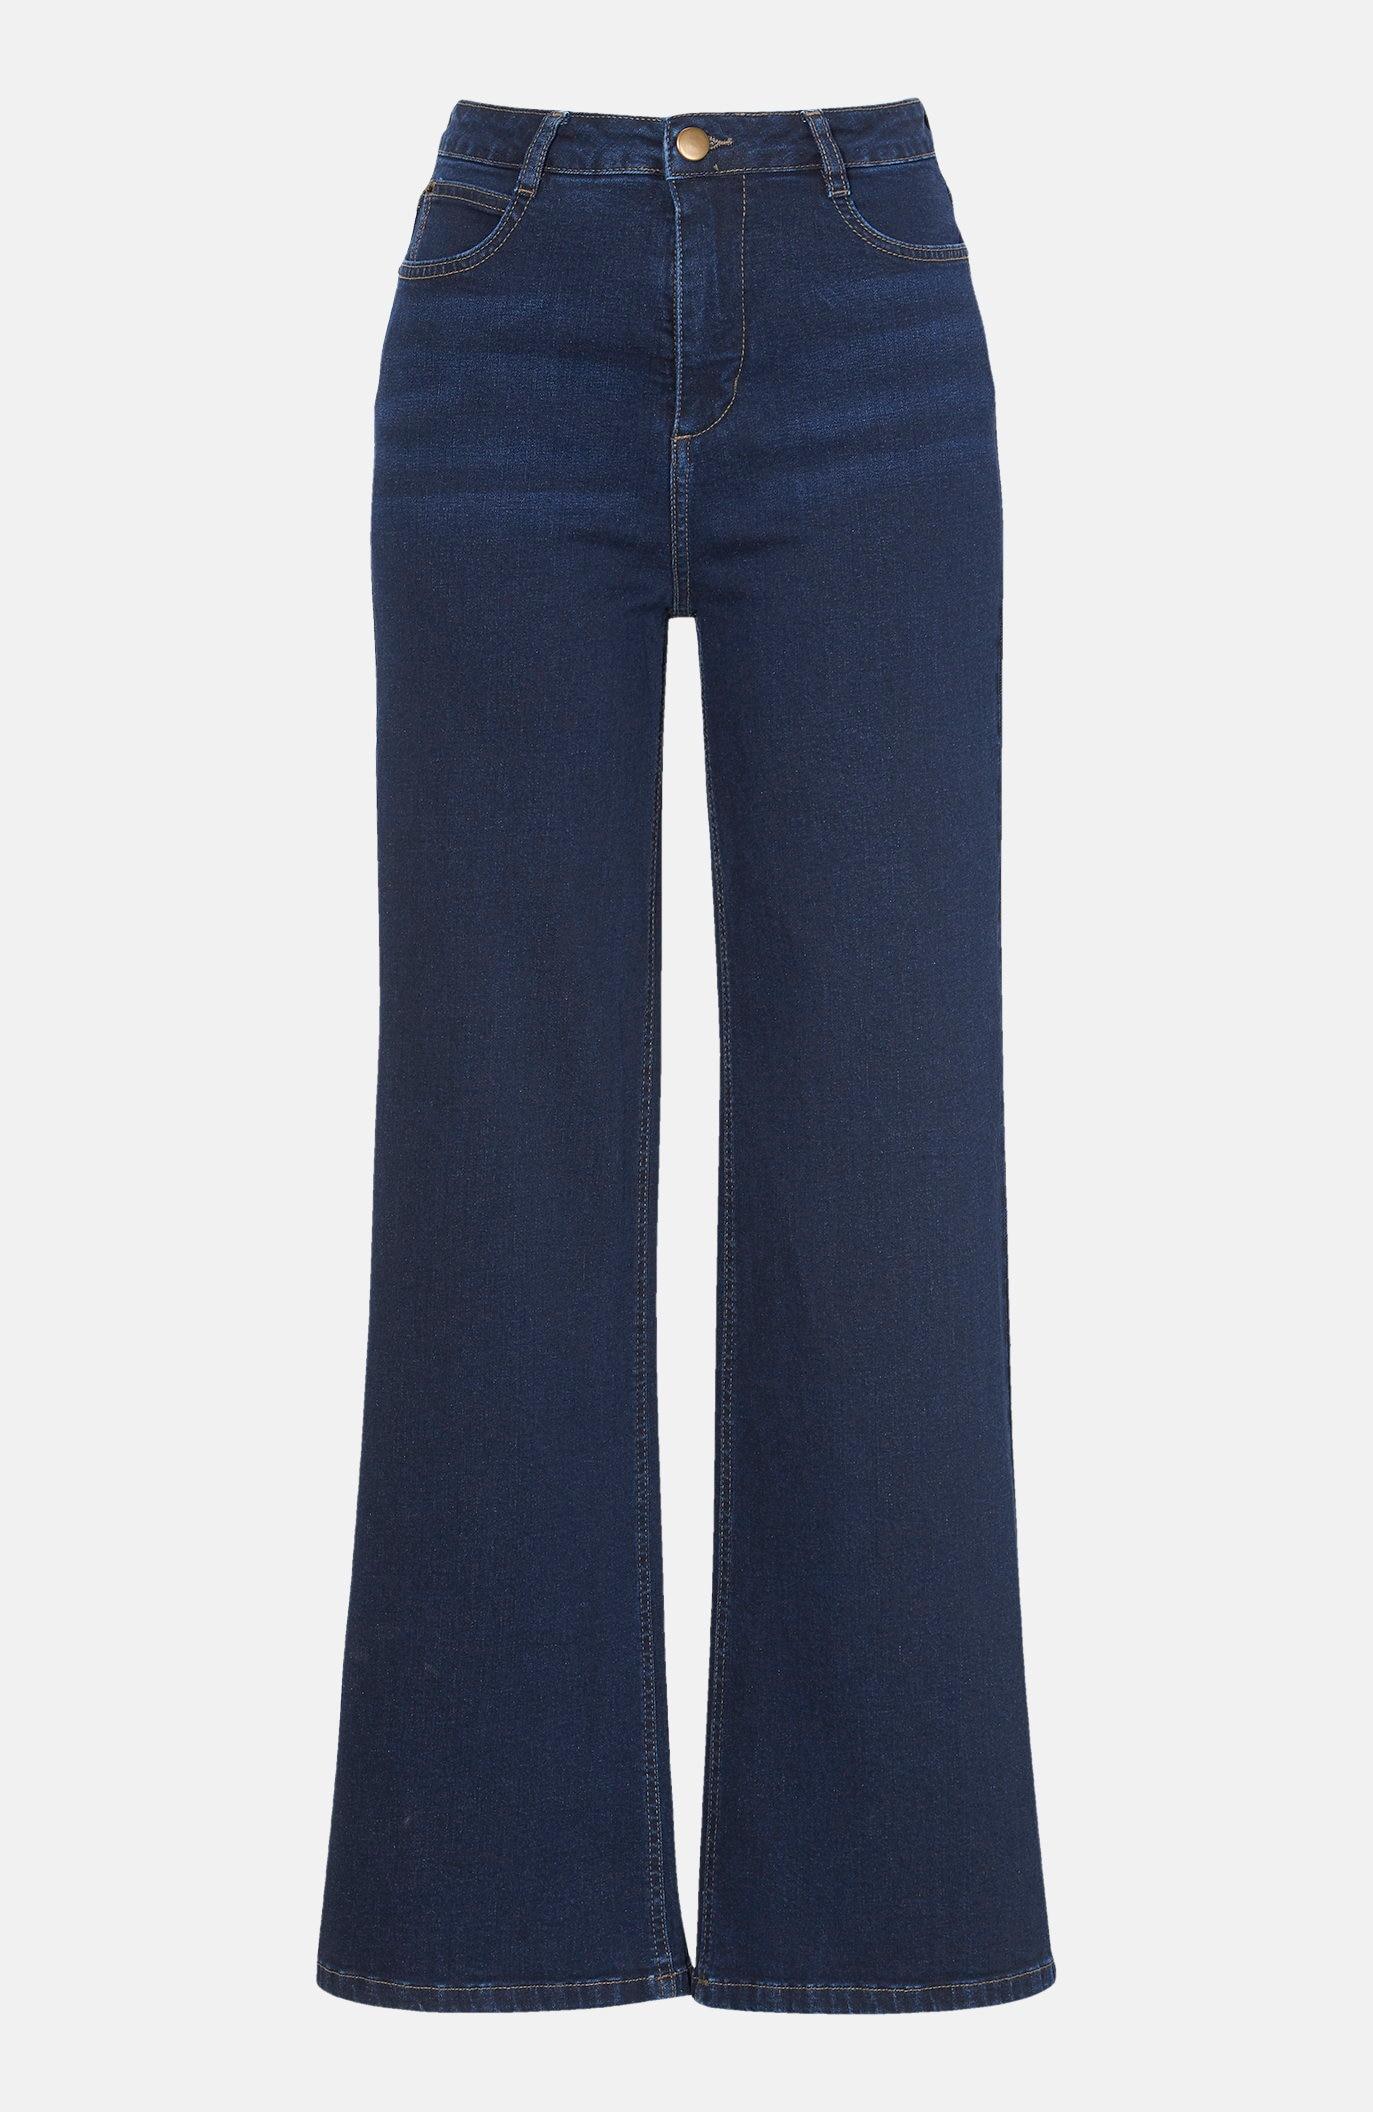 Jeans i ekologisk bomull med vida byxben